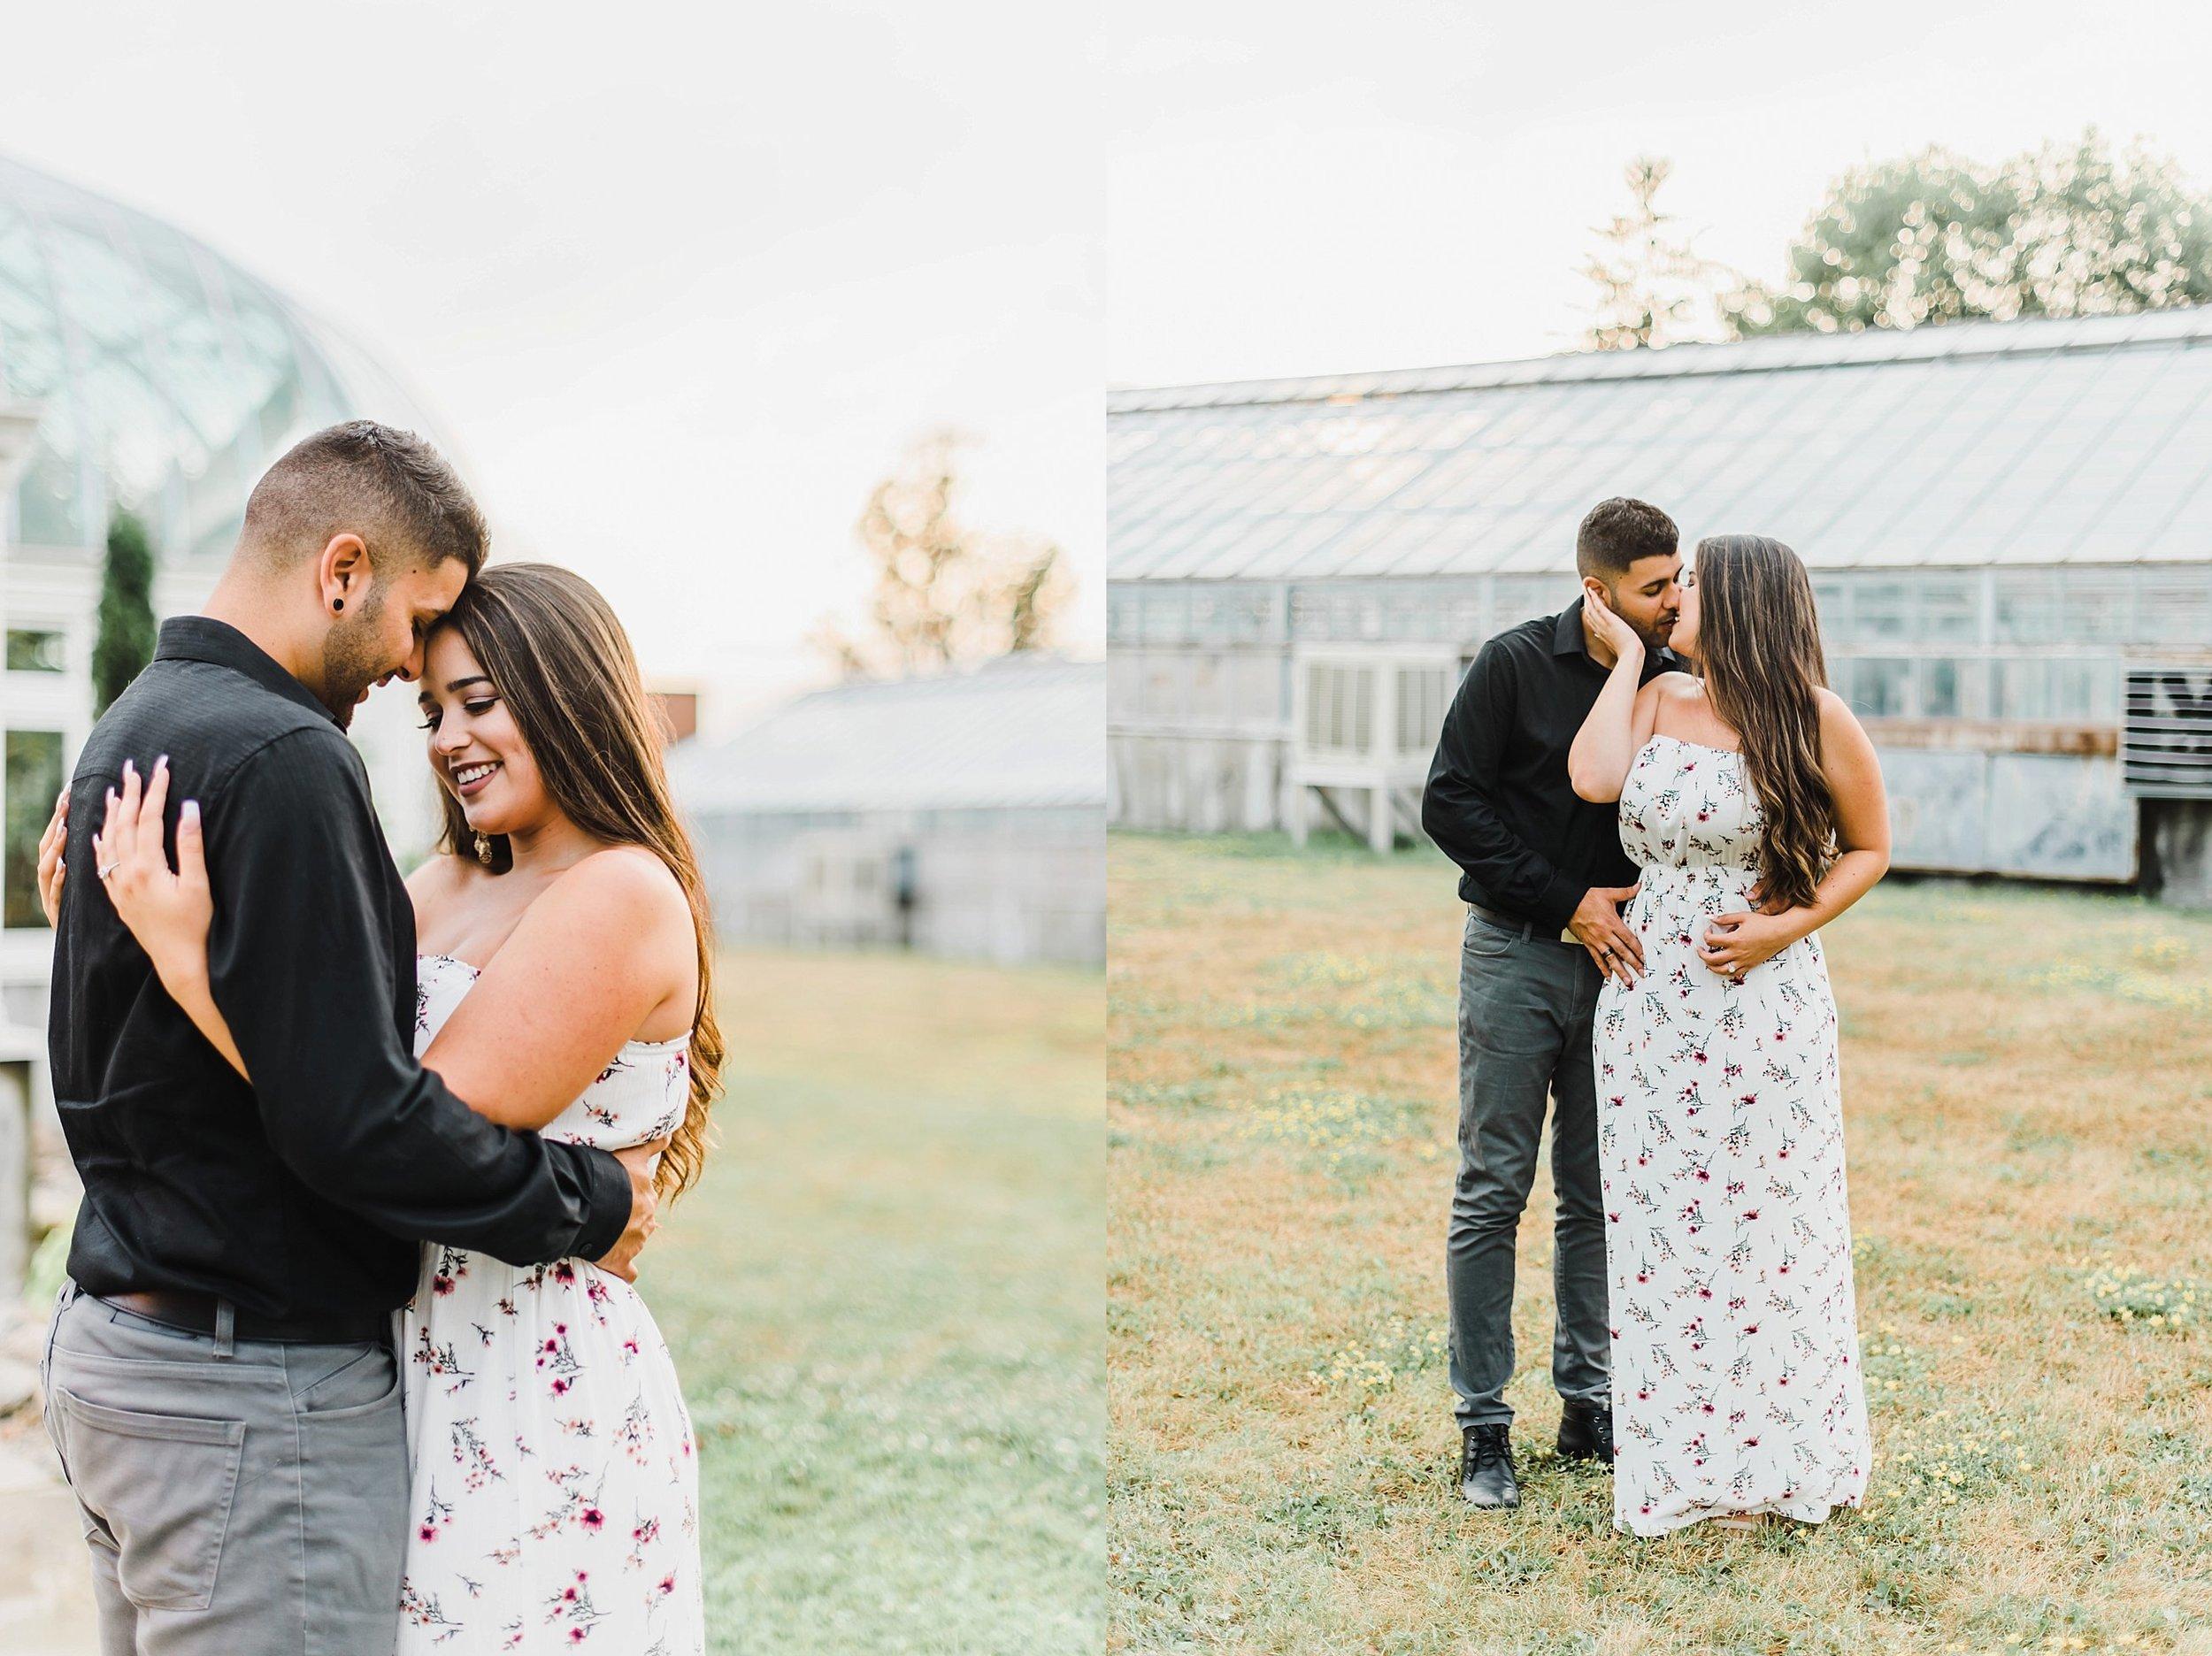 light airy indie fine art ottawa wedding photographer | Ali and Batoul Photography_0960.jpg